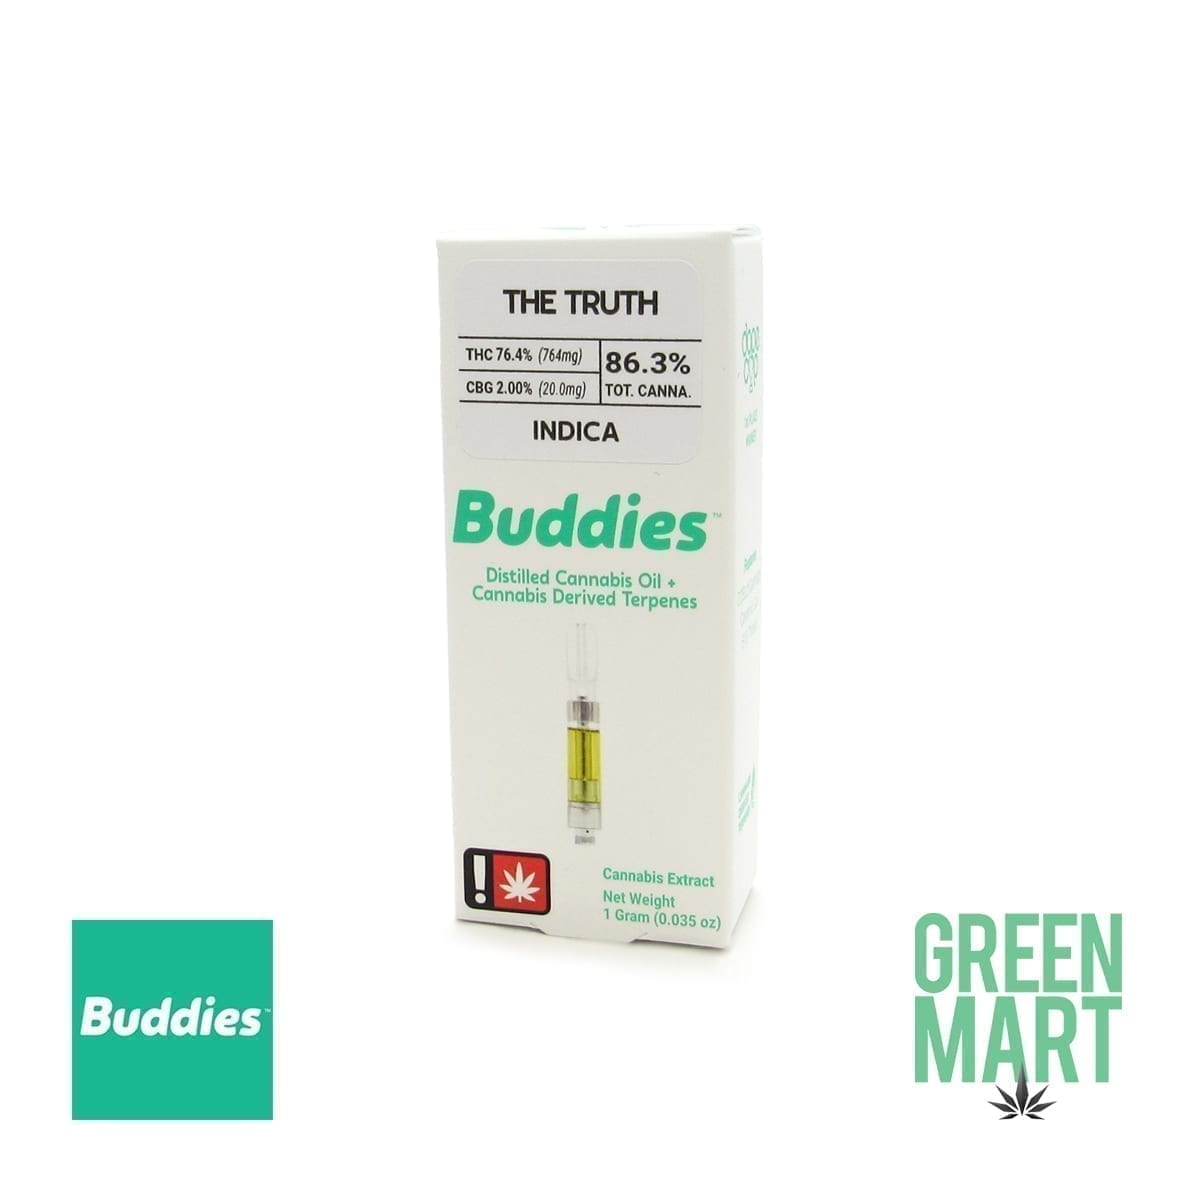 Buddies Brand Distillate Cartridge - The Truth